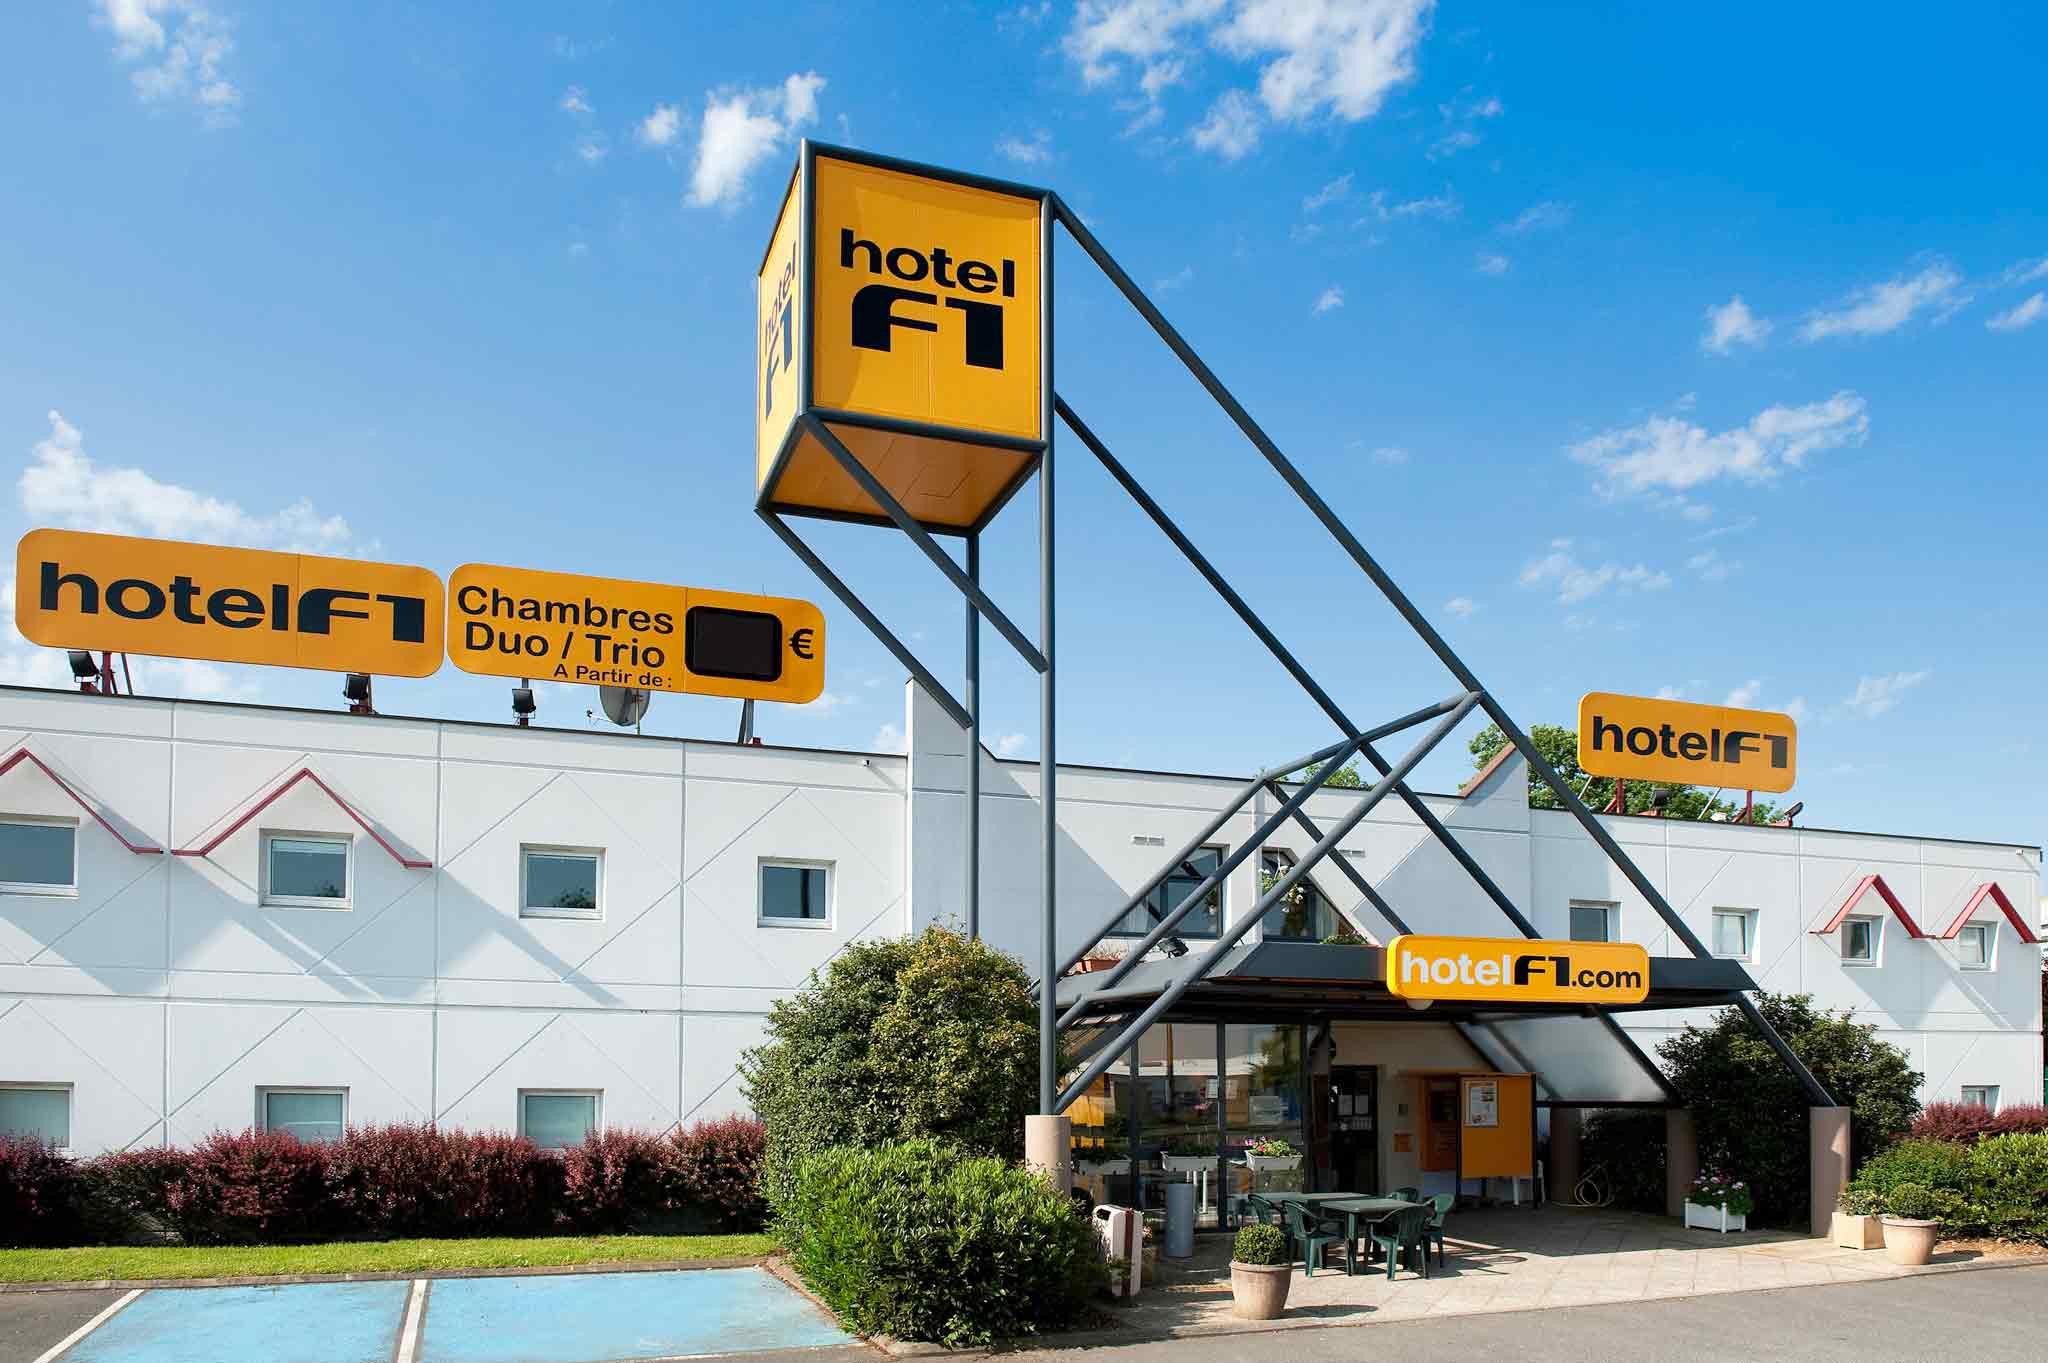 Hotel – hotelF1 Brie-Comte-Robert